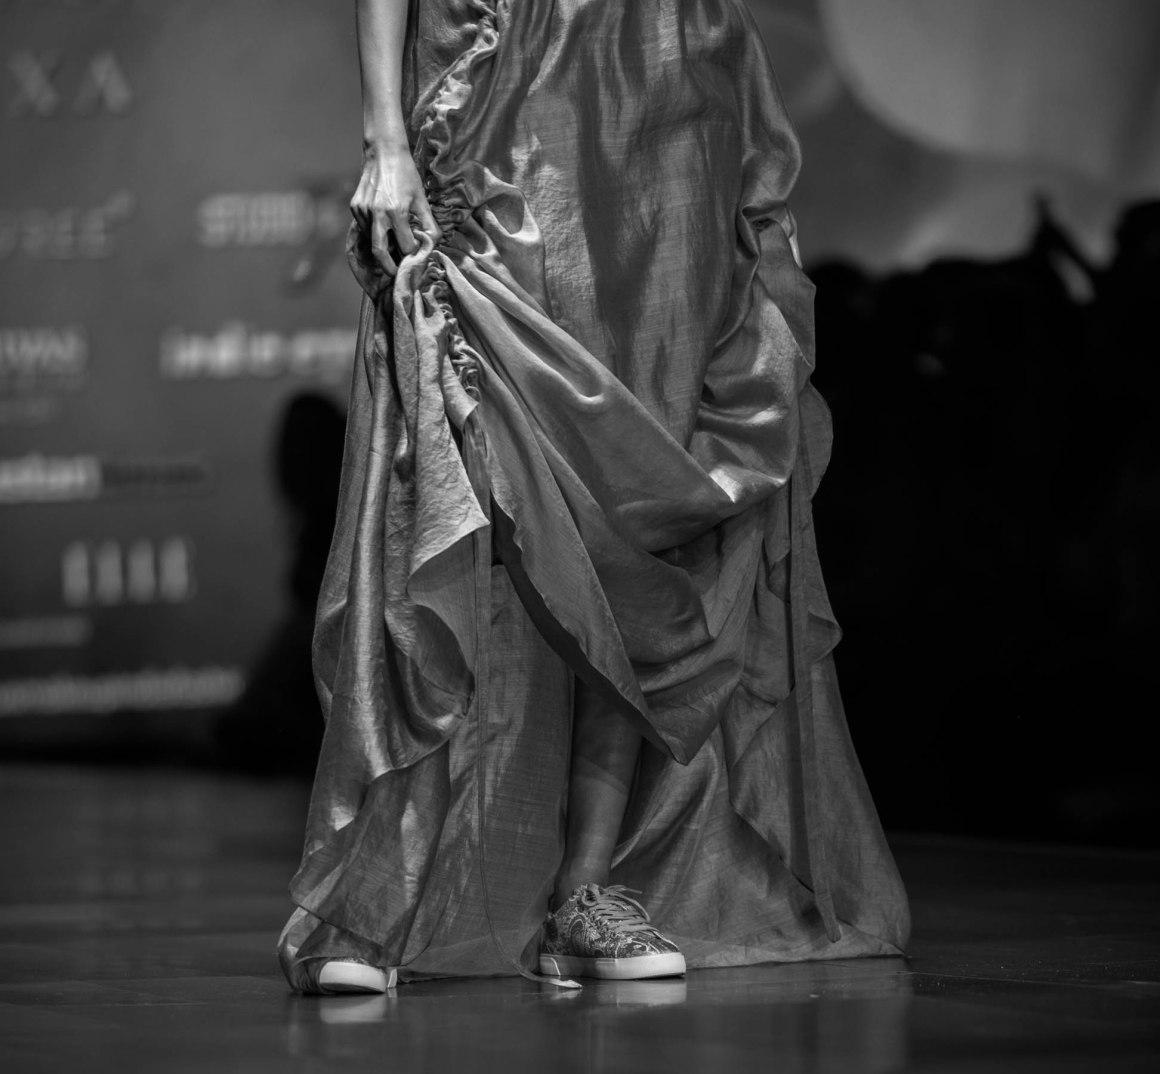 Naina Redhu, Naina.co, Diksha Khanna, Fashion Designer, FDCI, Lotus MakeUp India Fashion Week Spring Summer 2019, LMIFWSS19, LMIFW, India Fashion Week, Fashion Week Delhi, MadeInIndia, Made In India, EyesForFashion, Professional Photographer, Blogger, Fashion Photographer, Lifestyle Photographer, Luxury Photographer, Delhi Photographer, Gurgaon Photographer, Delhi Blogger, Gurgaon Blogger, Indian Blogger